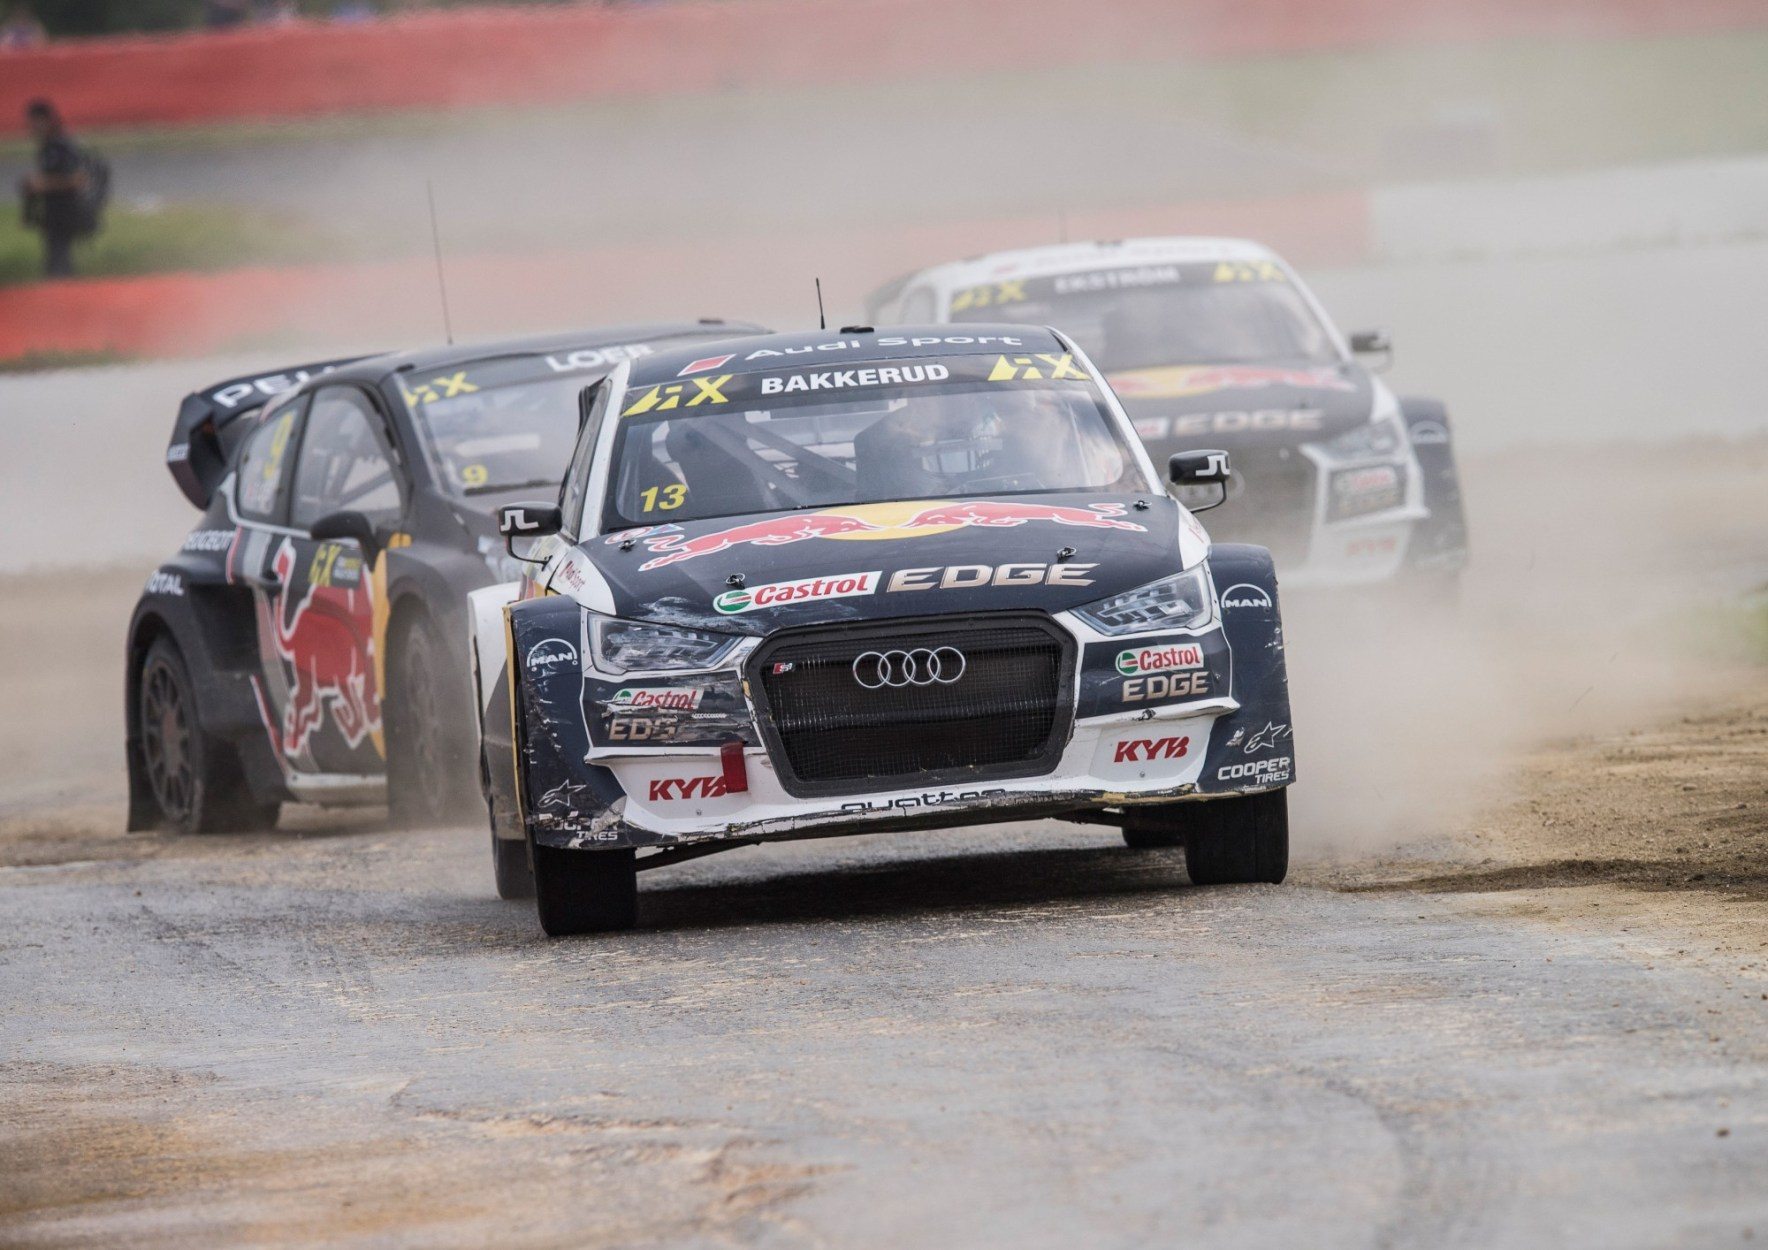 Rallycross Home Round for Audi Driver Bakkerud